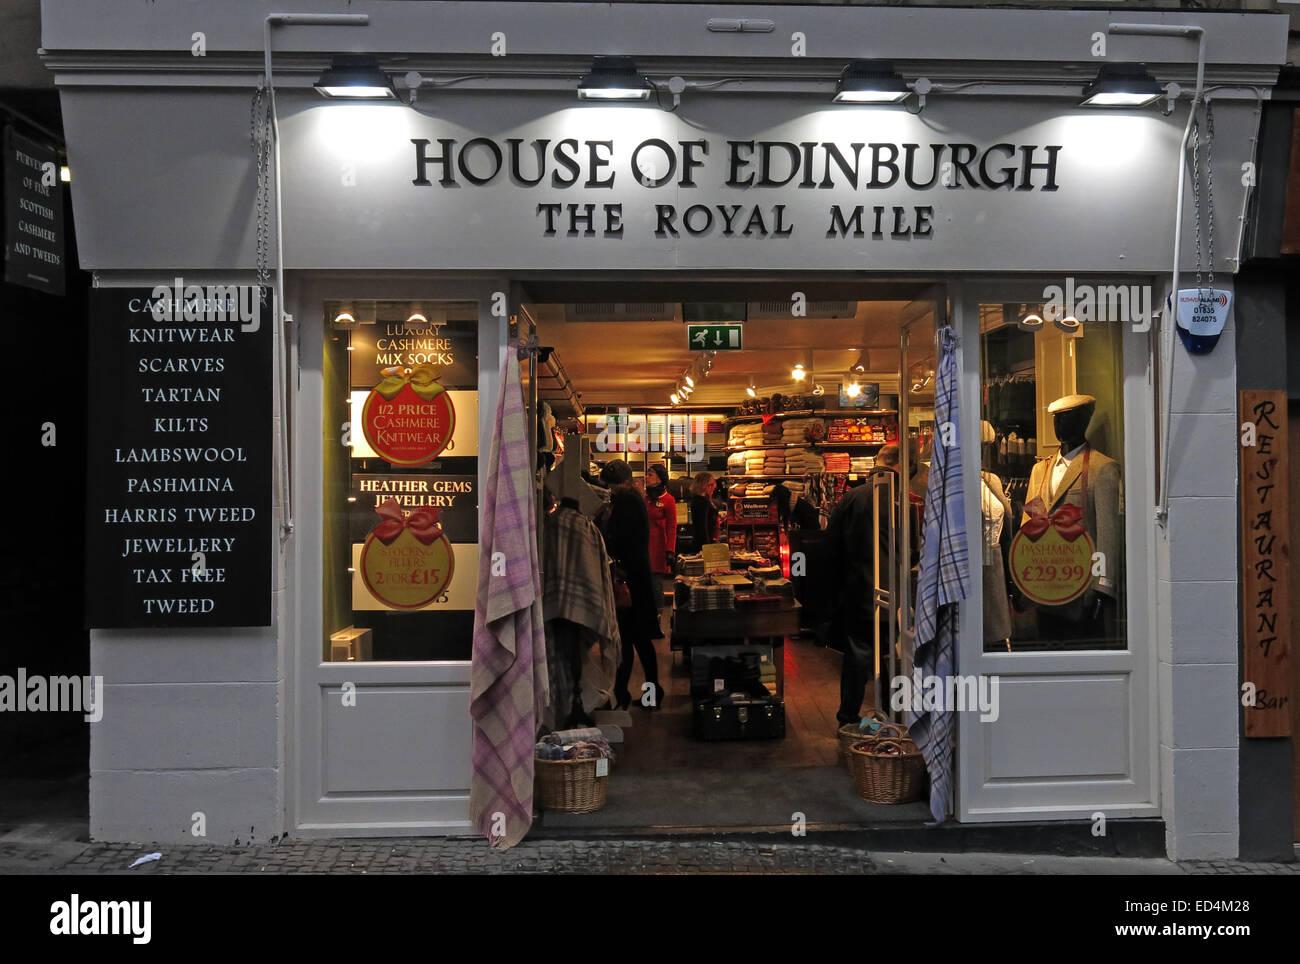 House of Edinburgh tourist shop, The Royal Mile, Scotland, UK Stock Photo